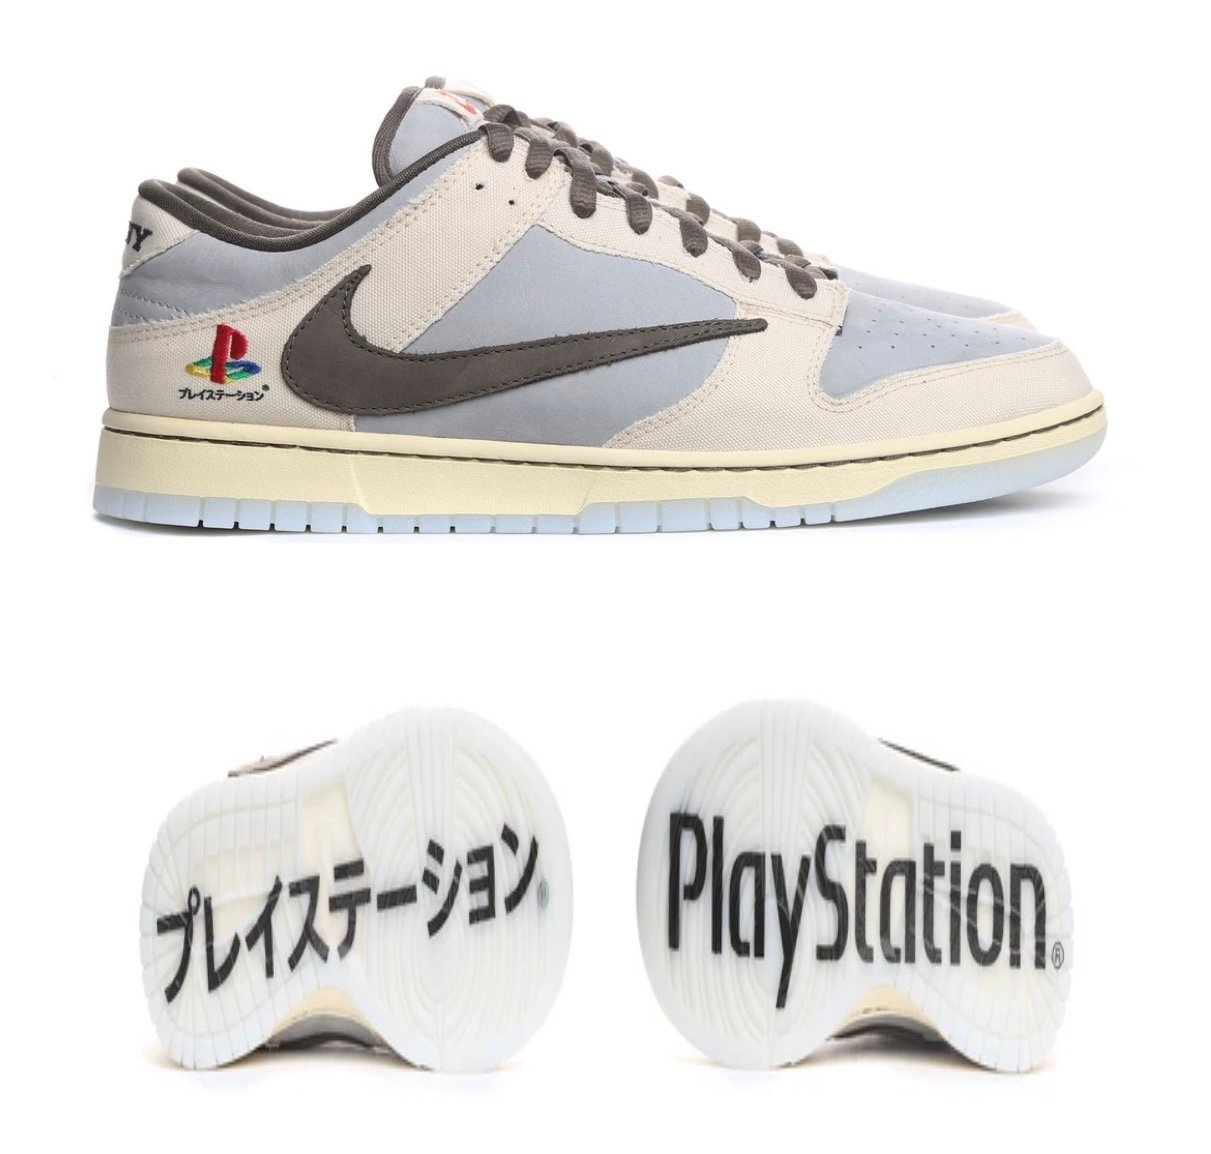 Travis Scott PlayStation Nike Dunk Low Release Details